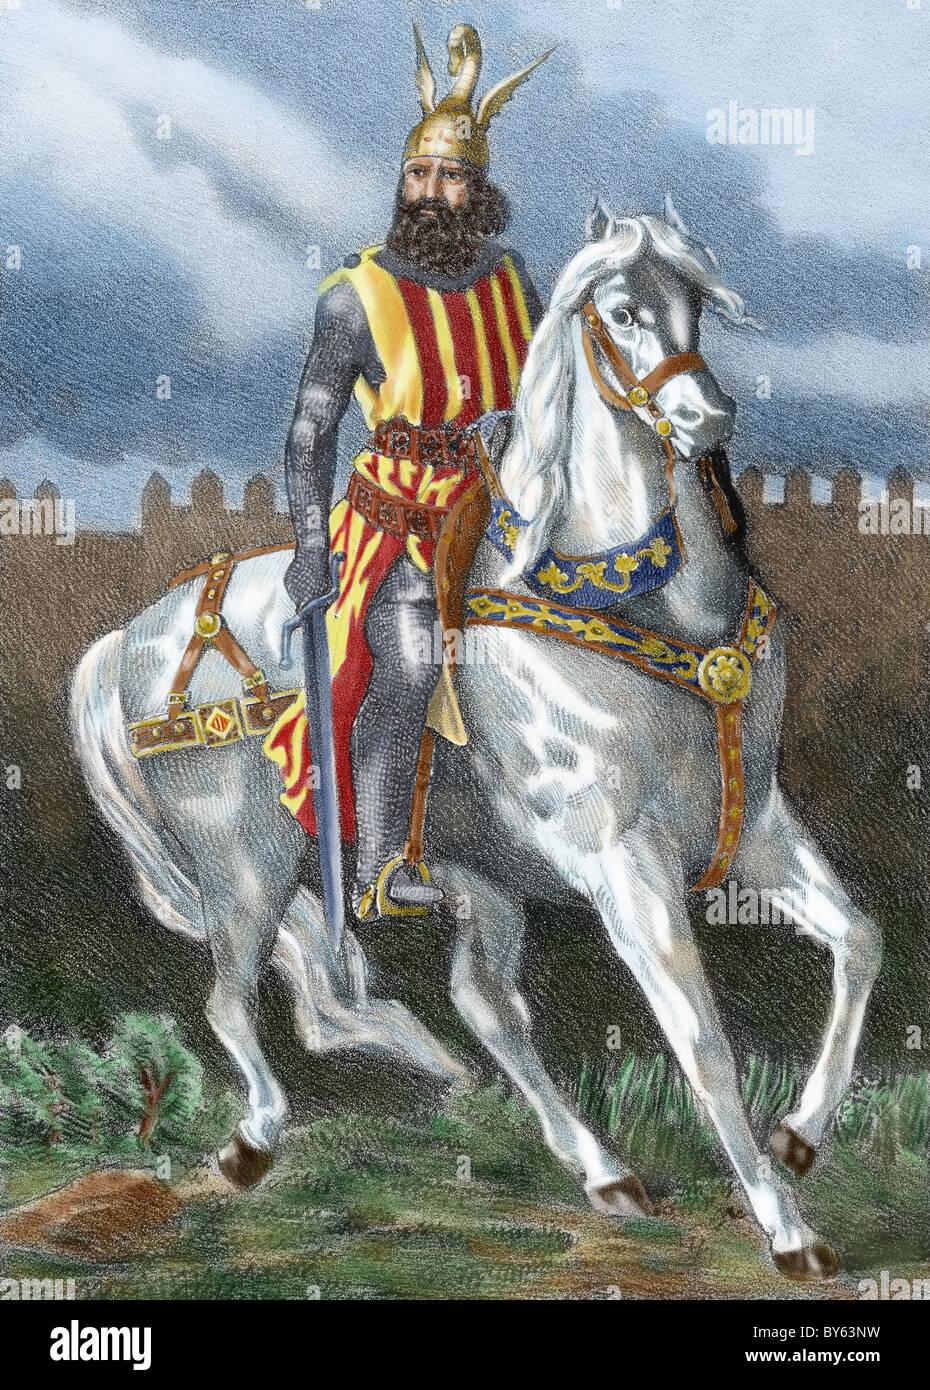 James I The Conqueror (1208-1276) on horseback. - Stock Image